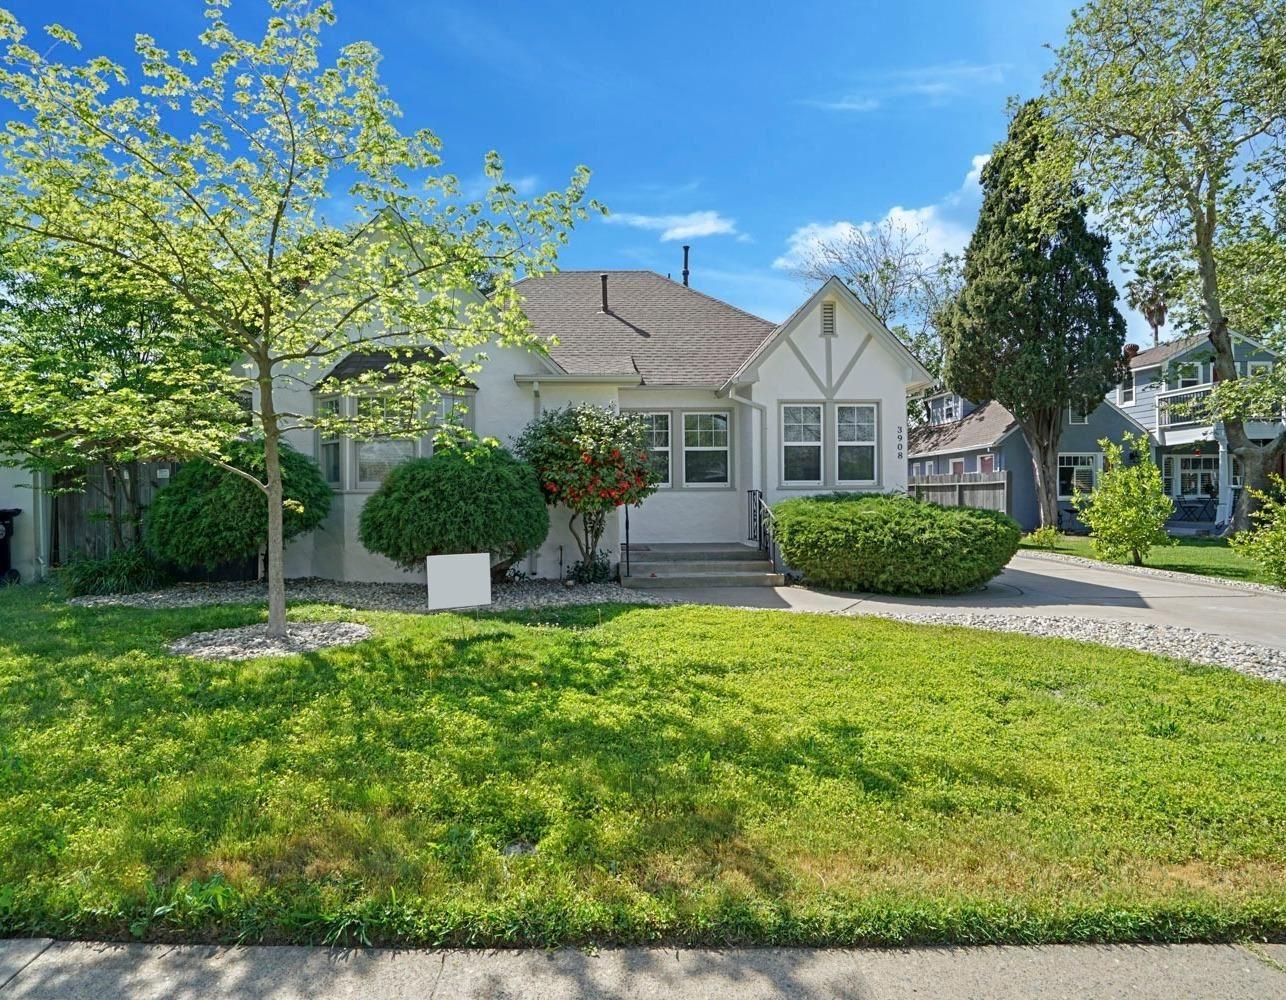 Photo of 3908 65th Street, Sacramento, CA 95820 (MLS # 221037980)